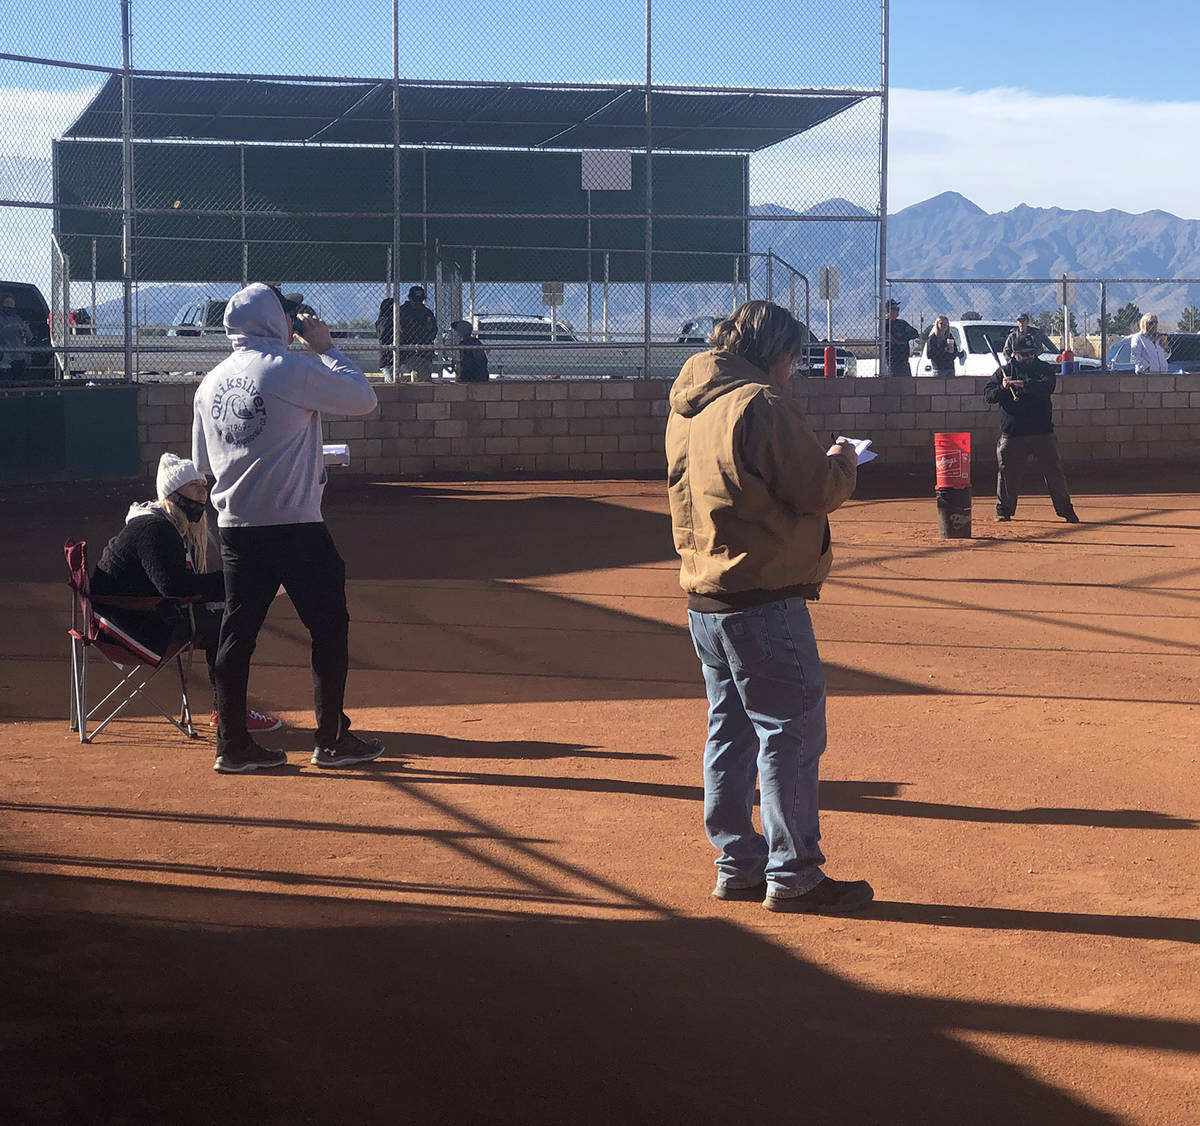 Tom Rysinski/Pahrump Valley Times Coaches watch as Richard Swingle hits ground balls during the ...